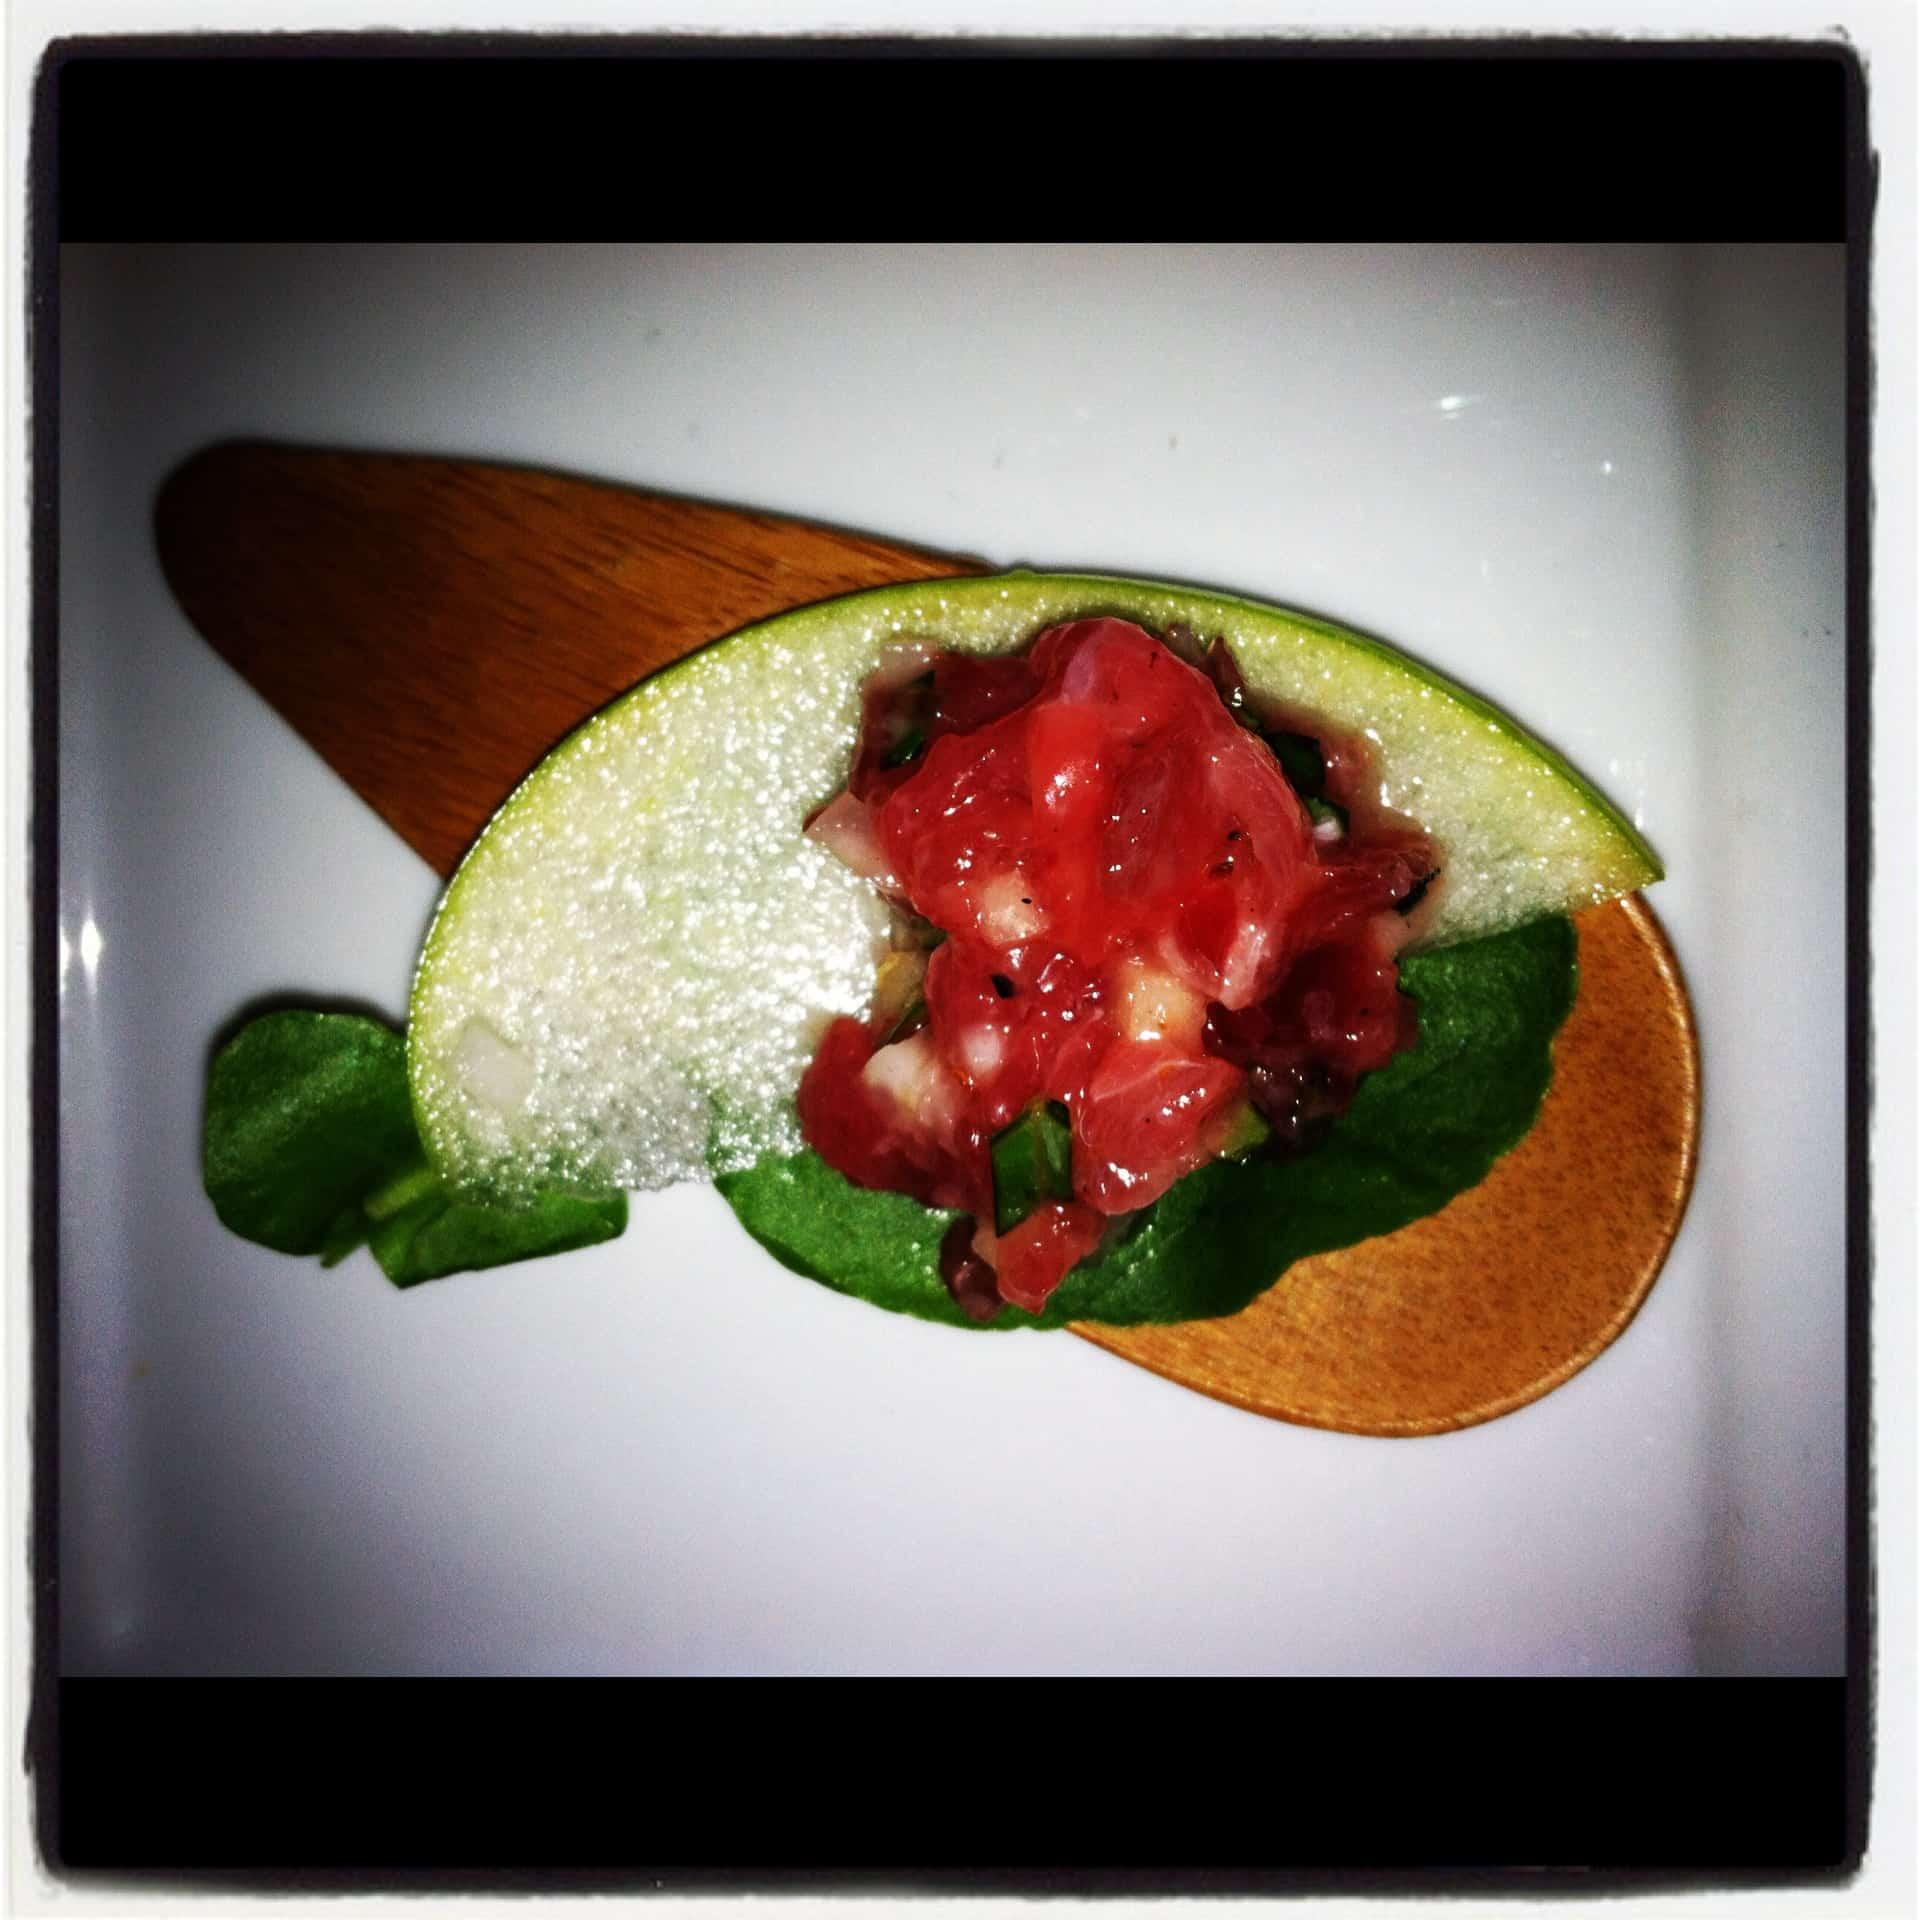 Inspired Cuisine at Rioja from the talented Jennifer Jasinski